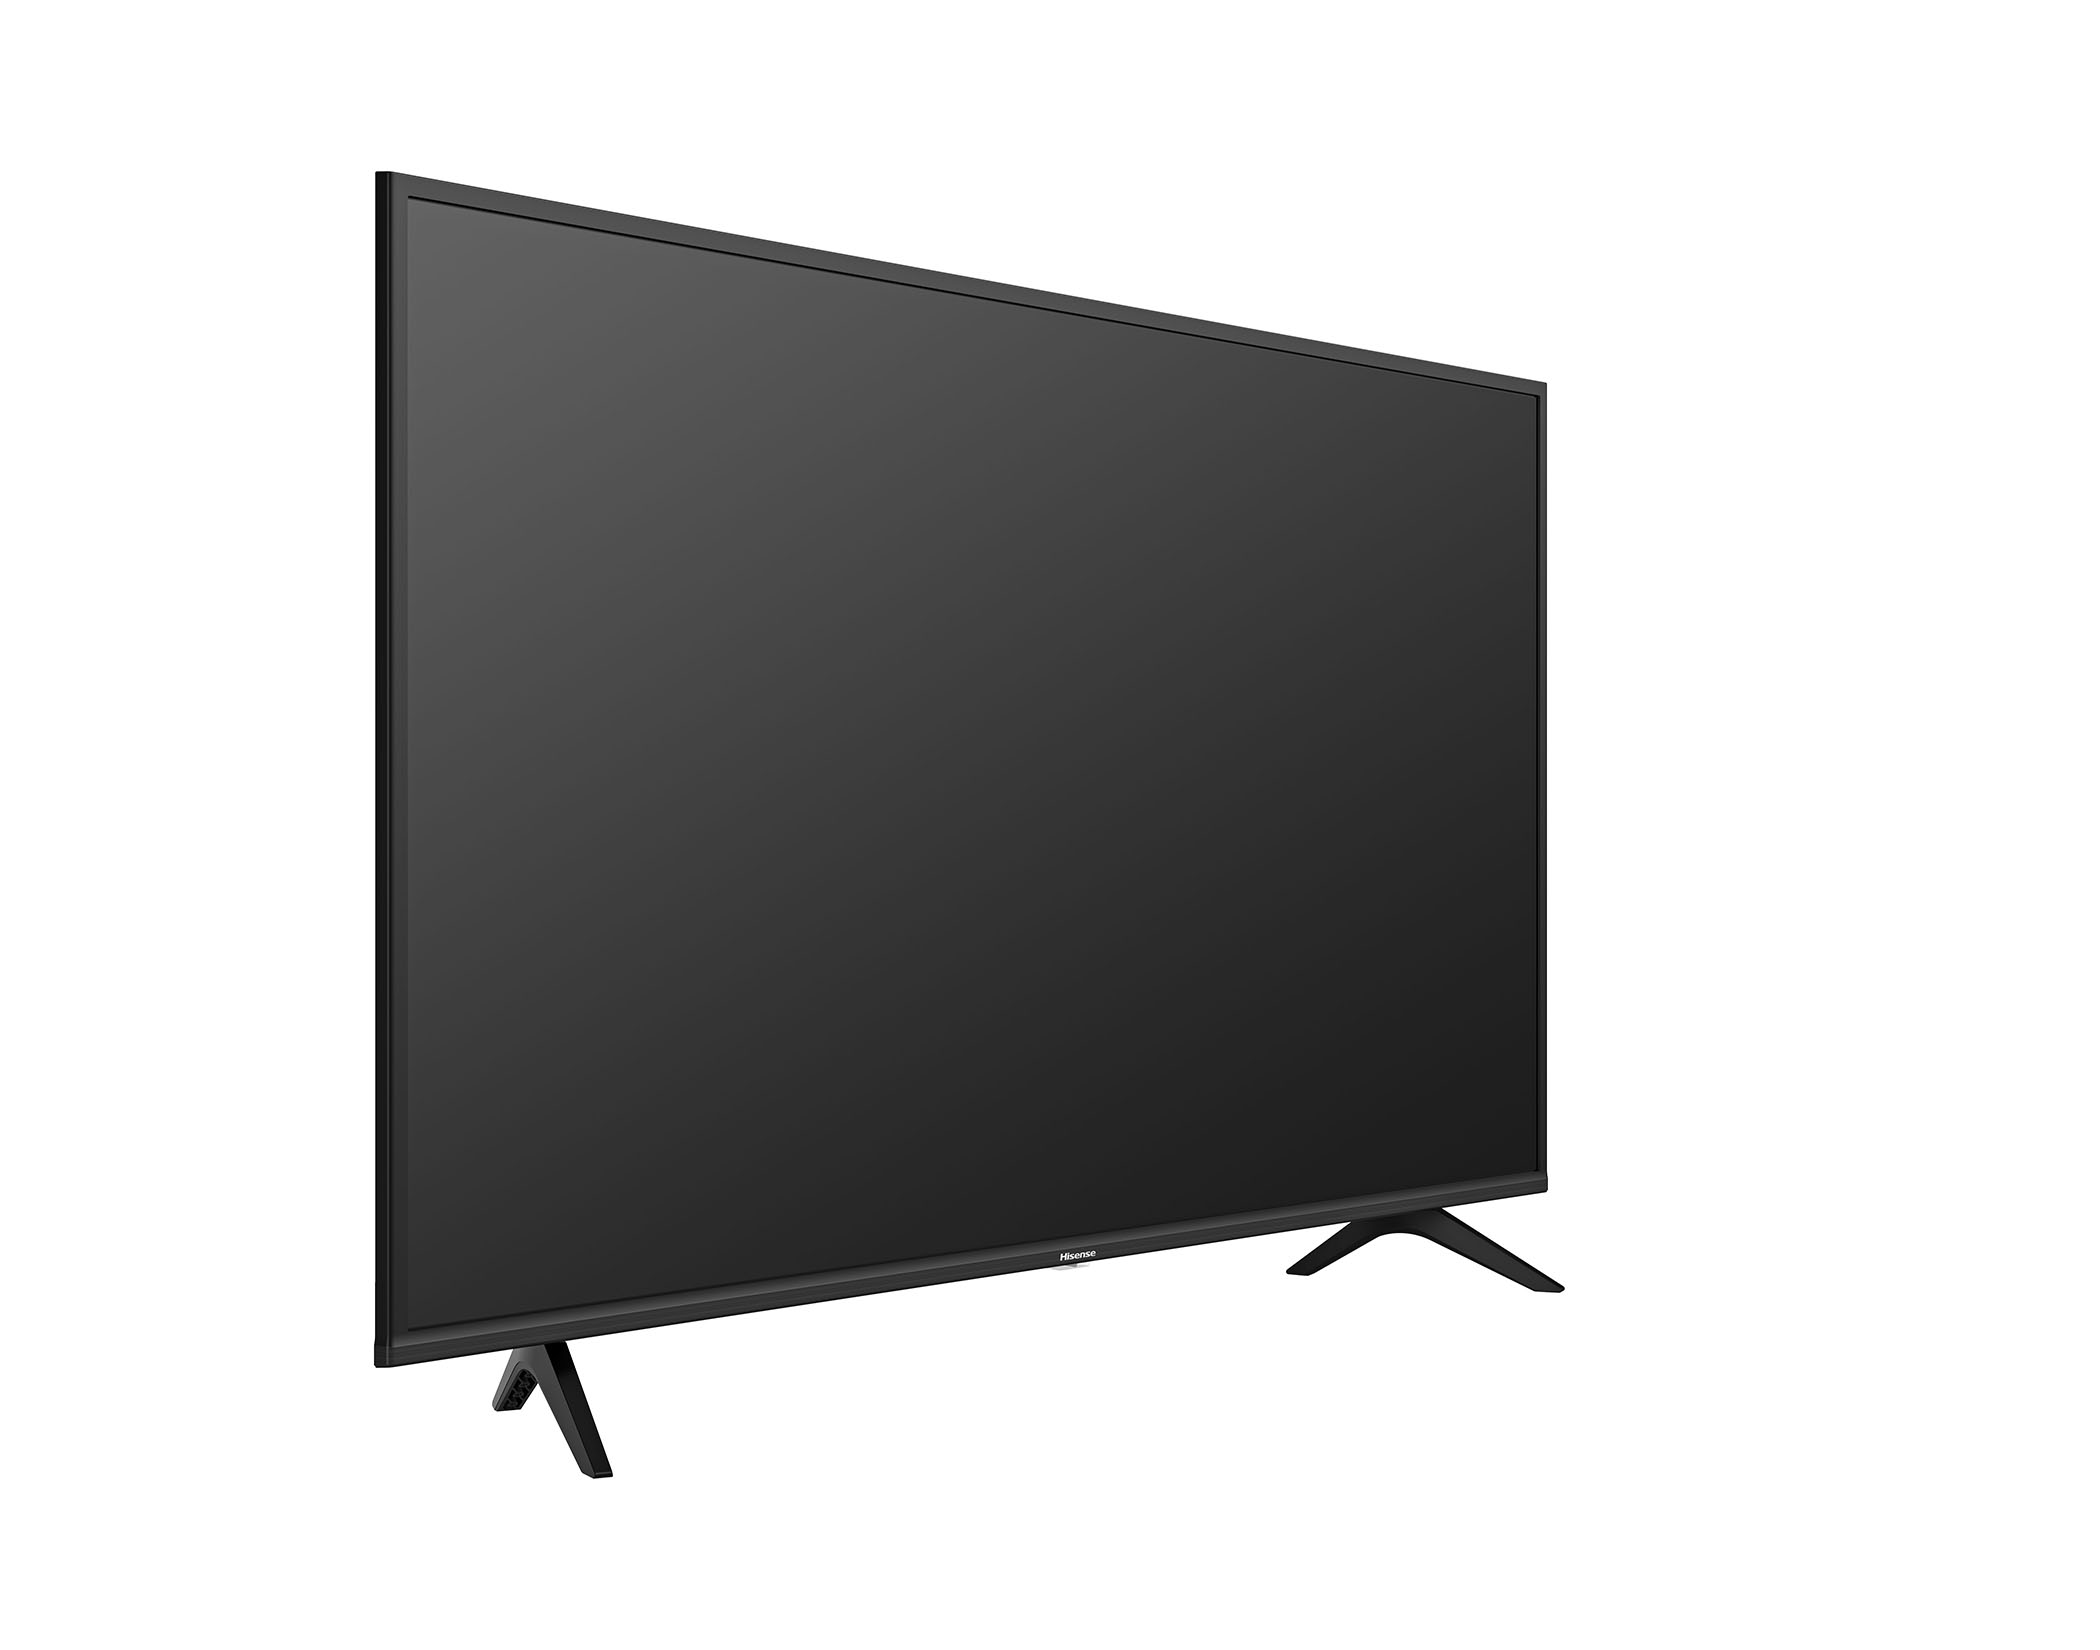 Hisense 49S4 FULL HD TV SERIES 4 main